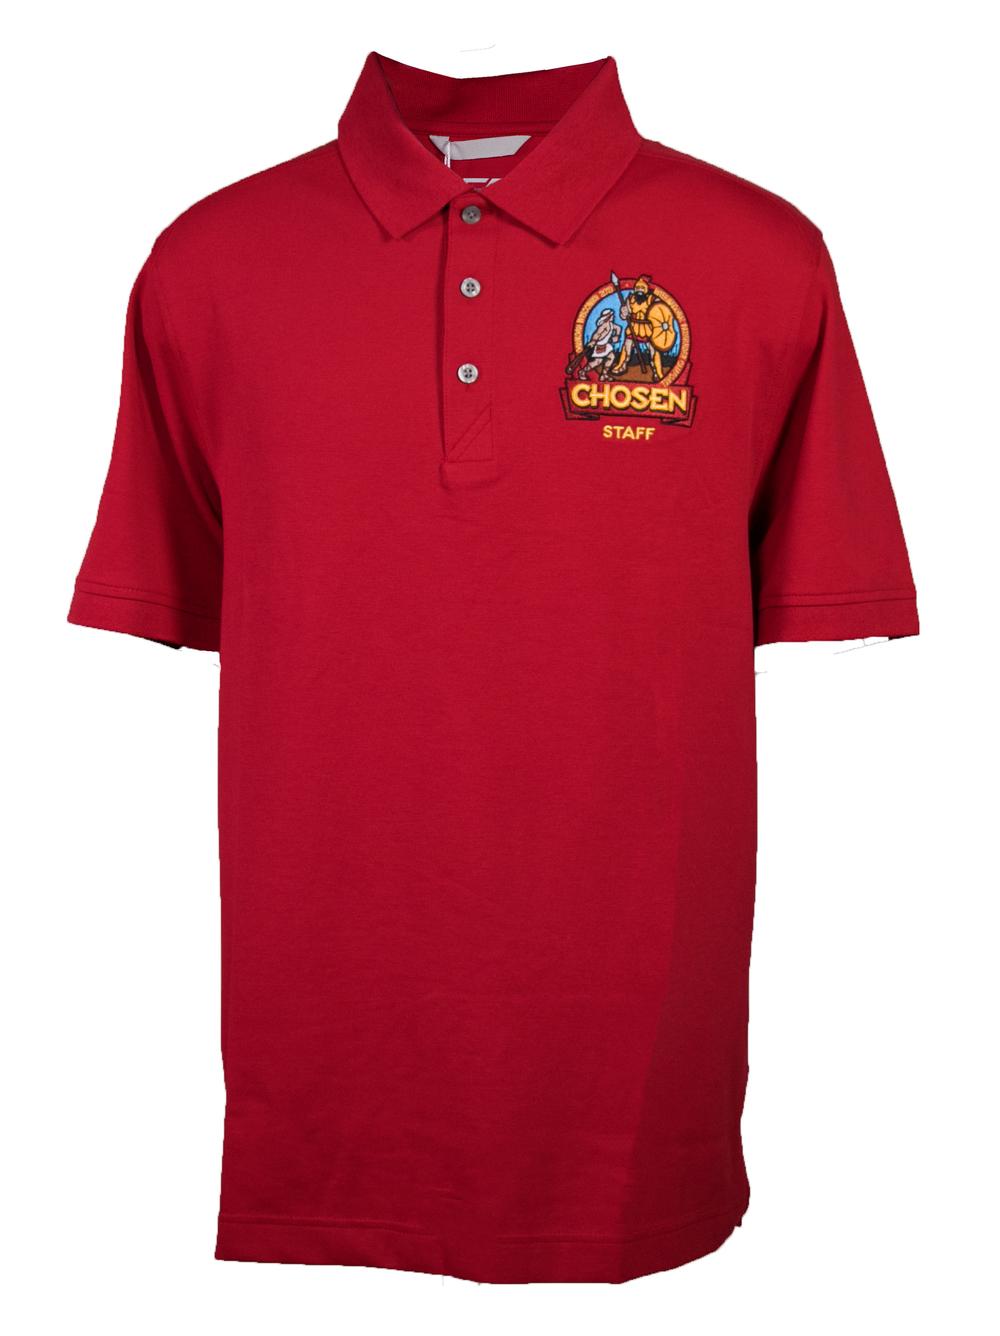 Chosen Men's Staff Polo - Red